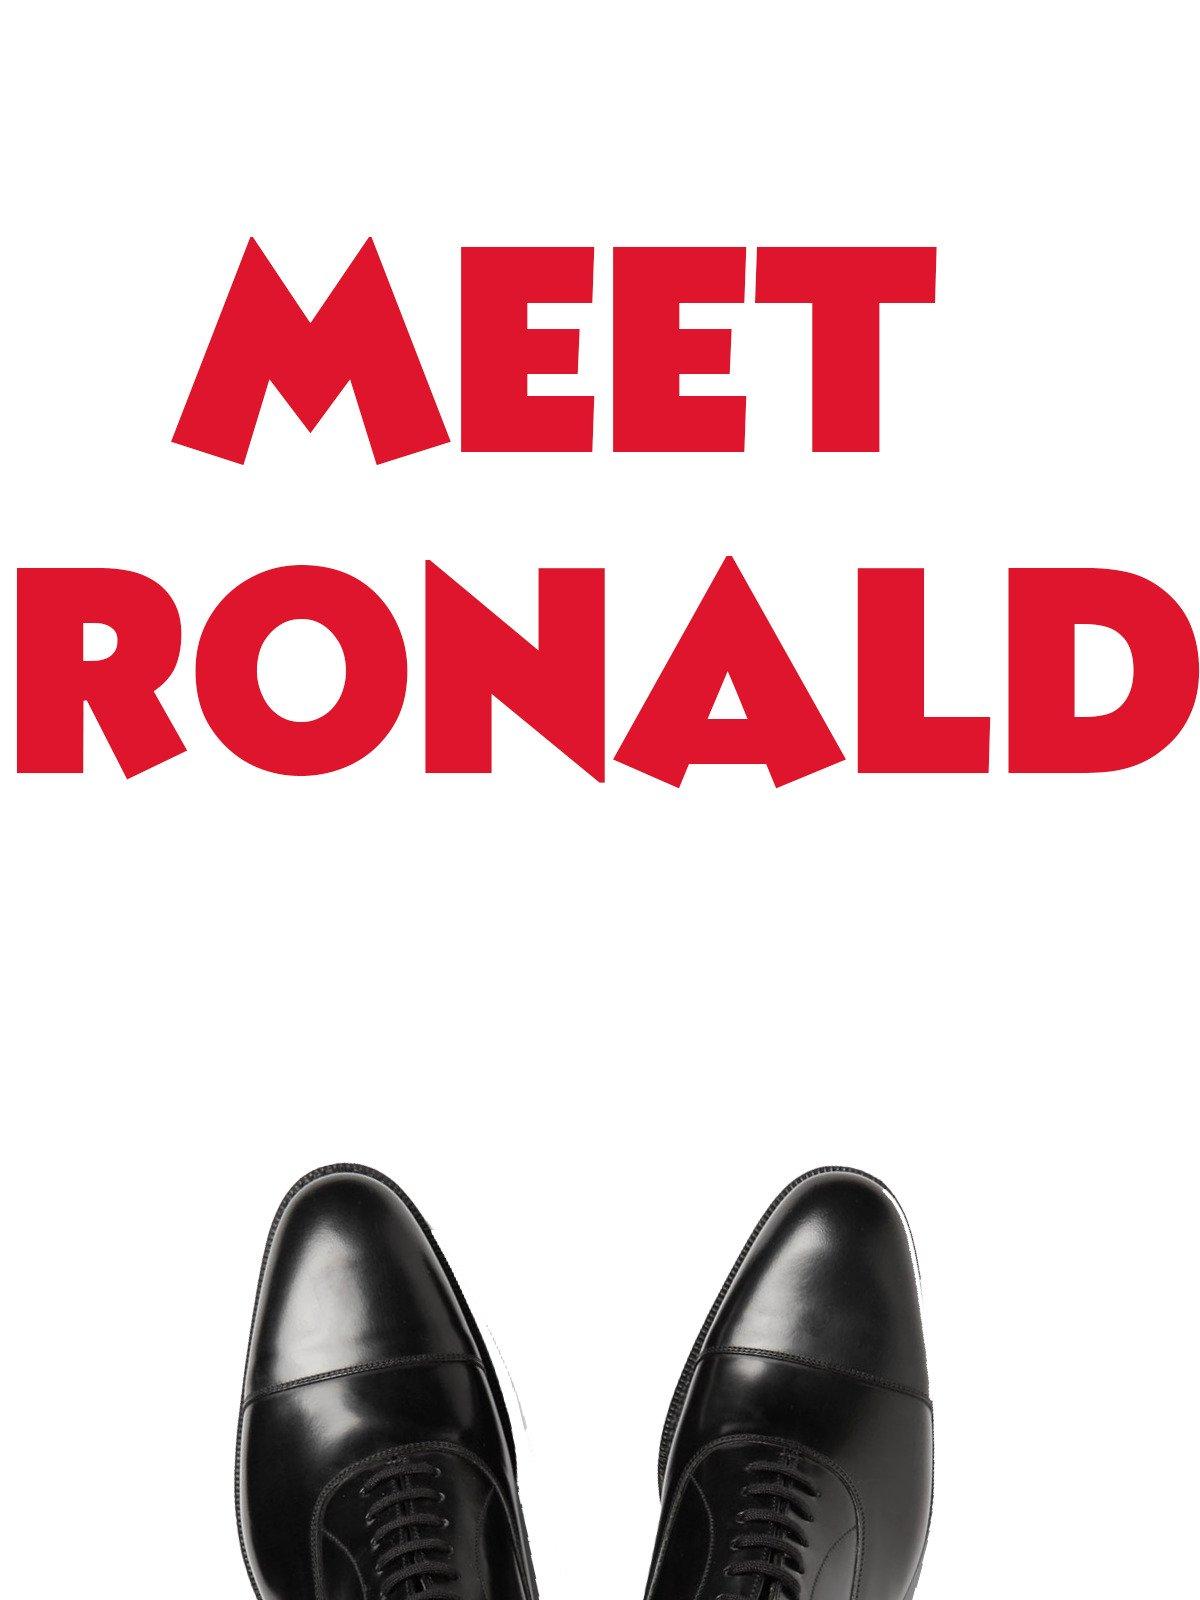 Meet Ronald on Amazon Prime Video UK